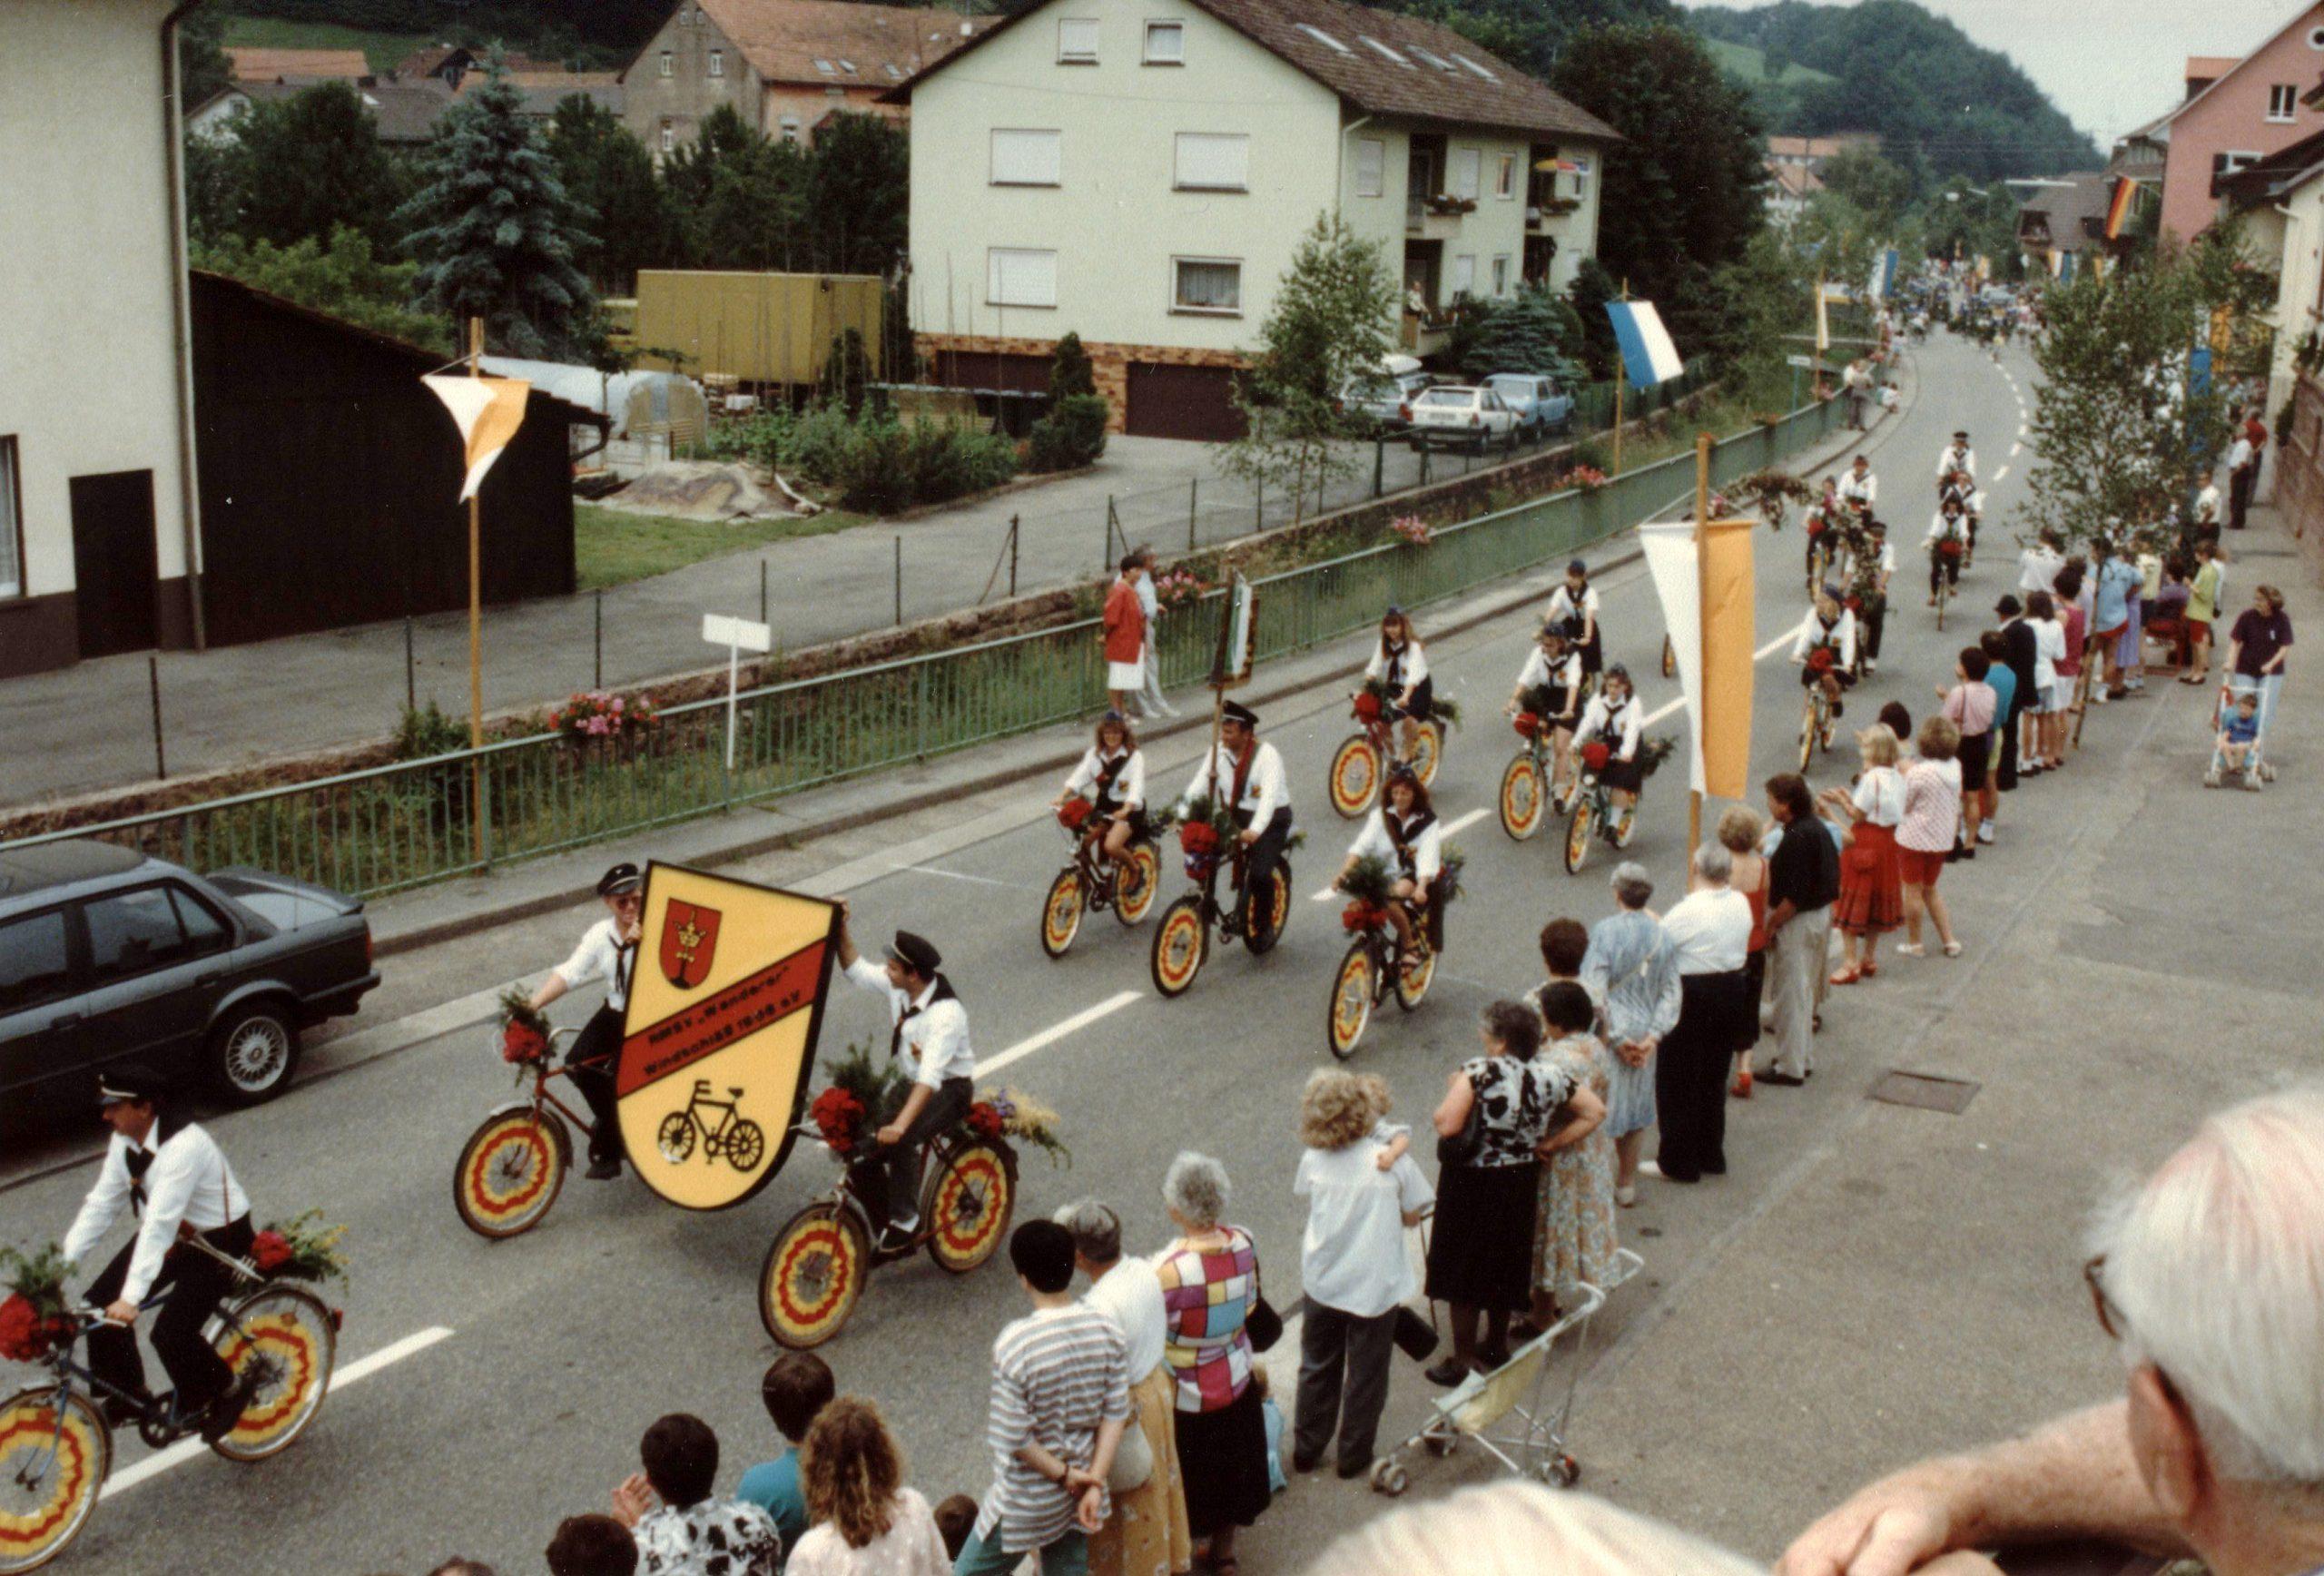 800 85 Jahre Radfahrverein 6a Umzug Juli 1992 tw scaled